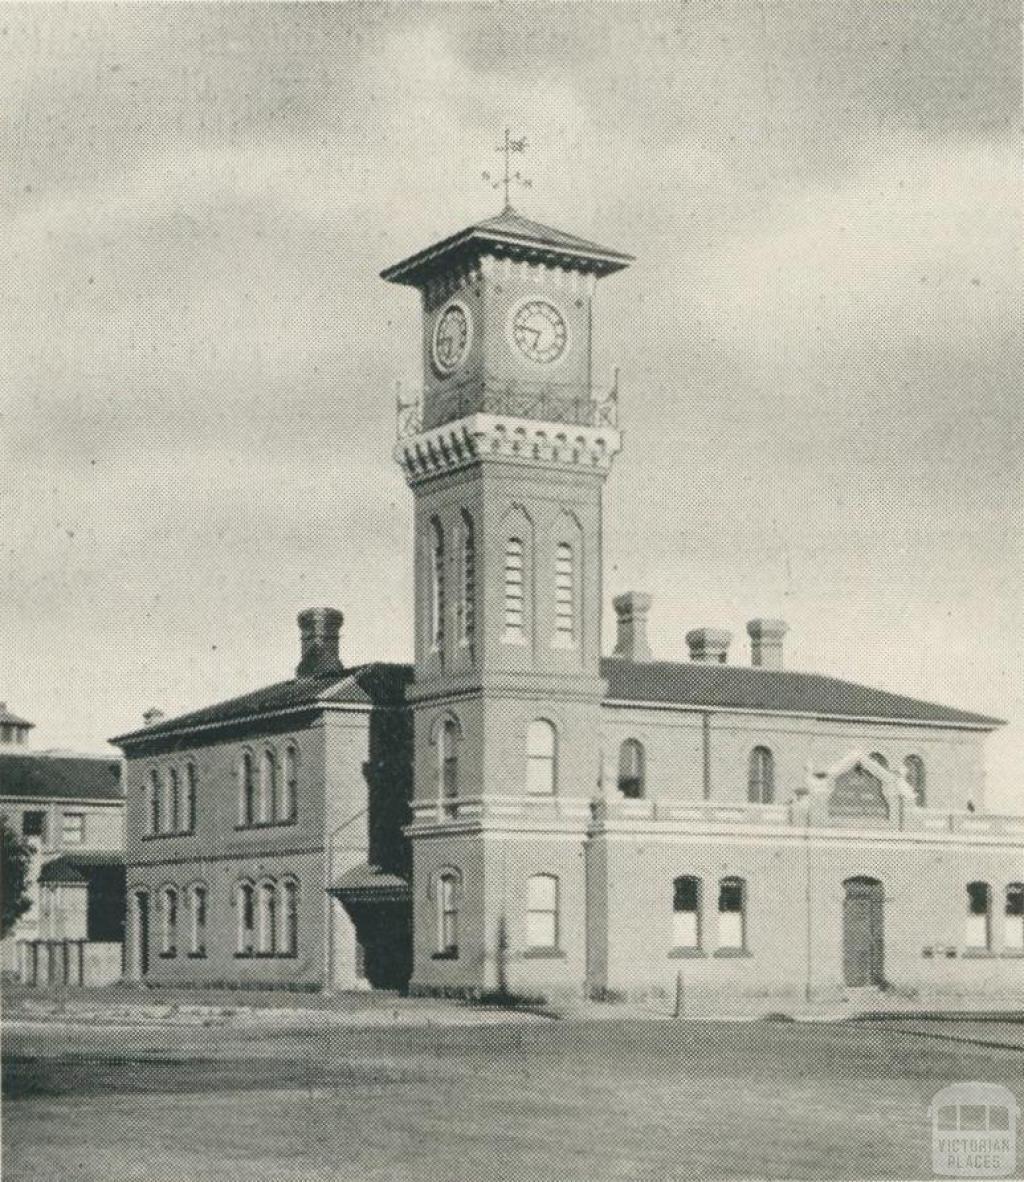 Sale Post Office, 1938